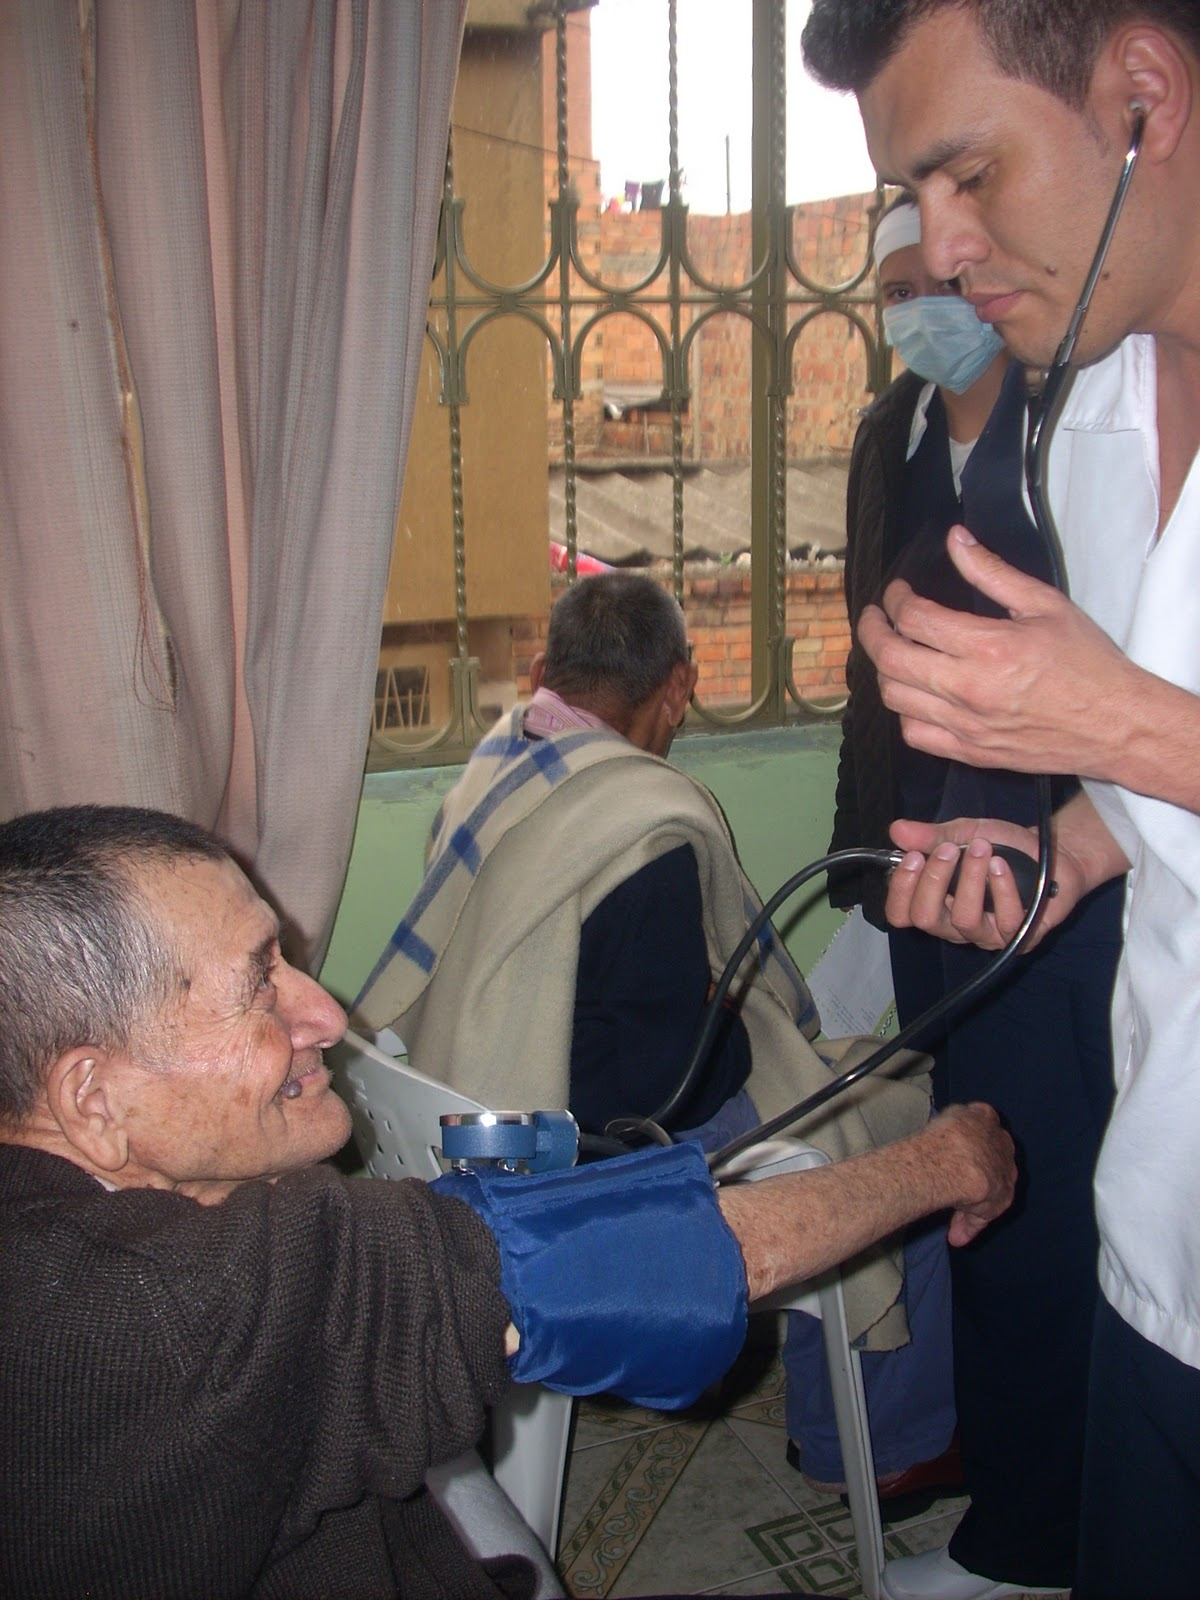 Auxiliares de Enfermería POR QUE SE ESTUDIAR ENFERMERÍA | AUXILIARES ...